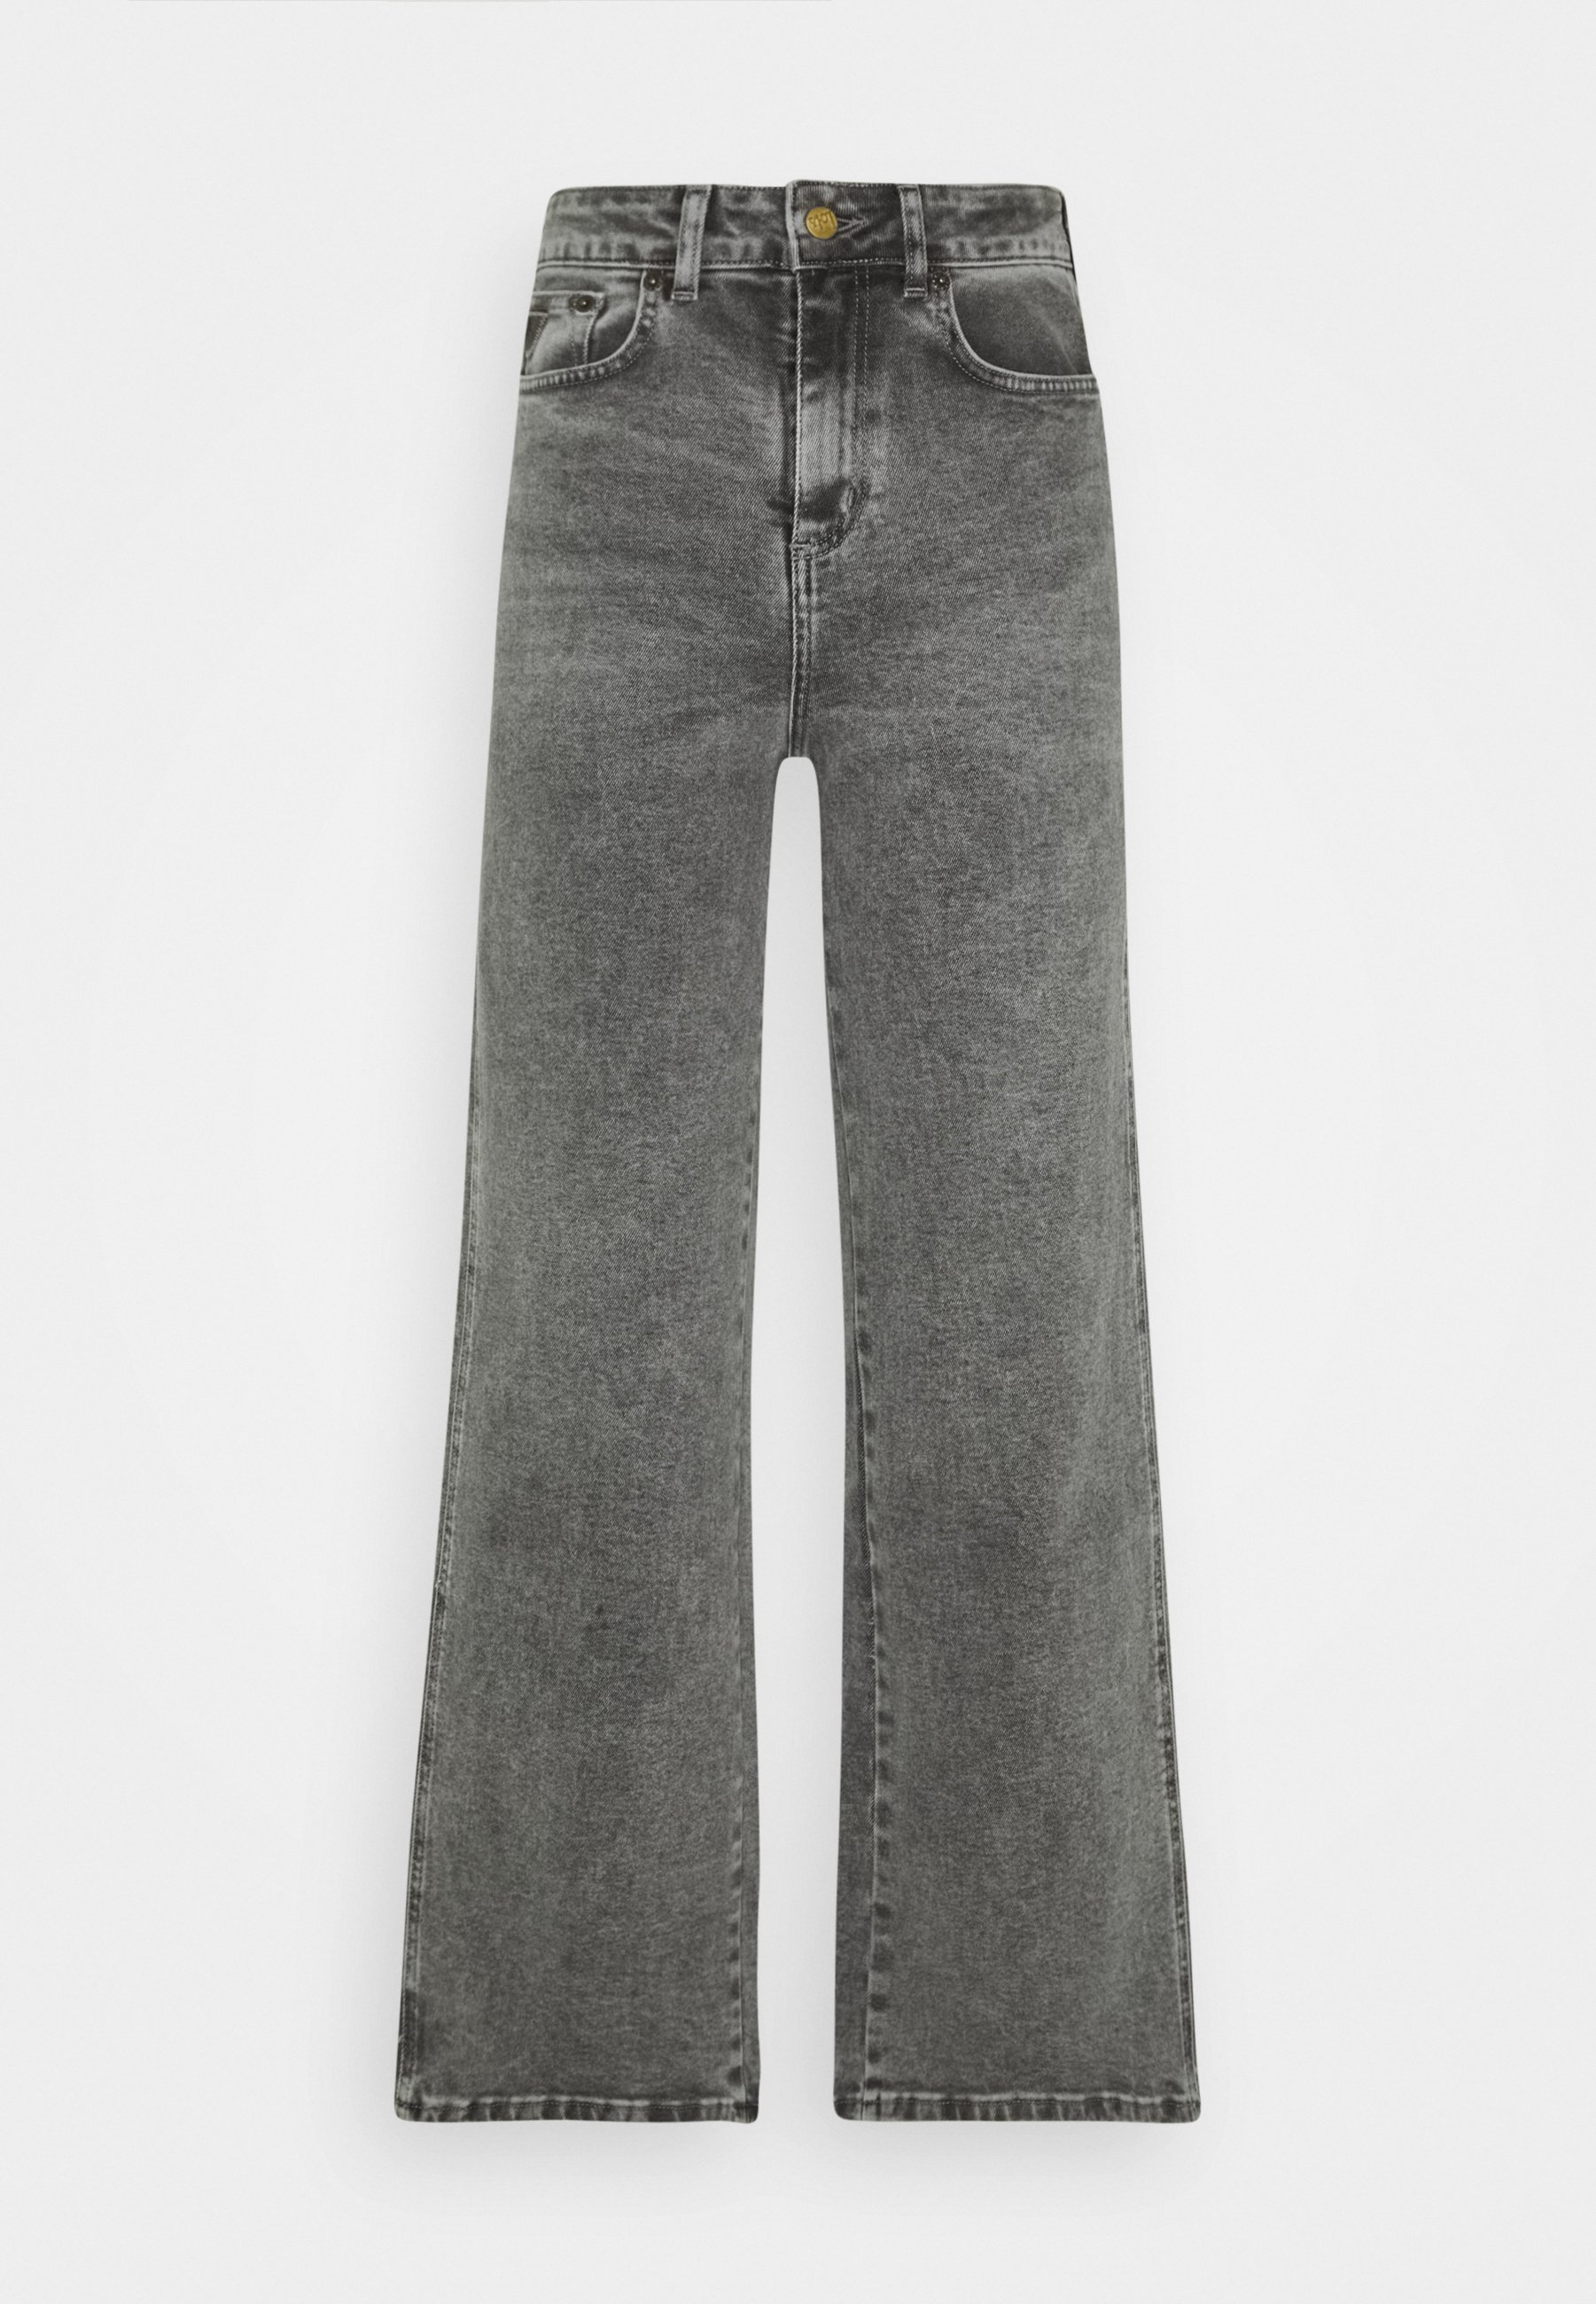 Puerto marítimo sobrino Bocadillo  LOIS Jeans RACHEL - Flared Jeans - stone grey/grey denim - Zalando.ie